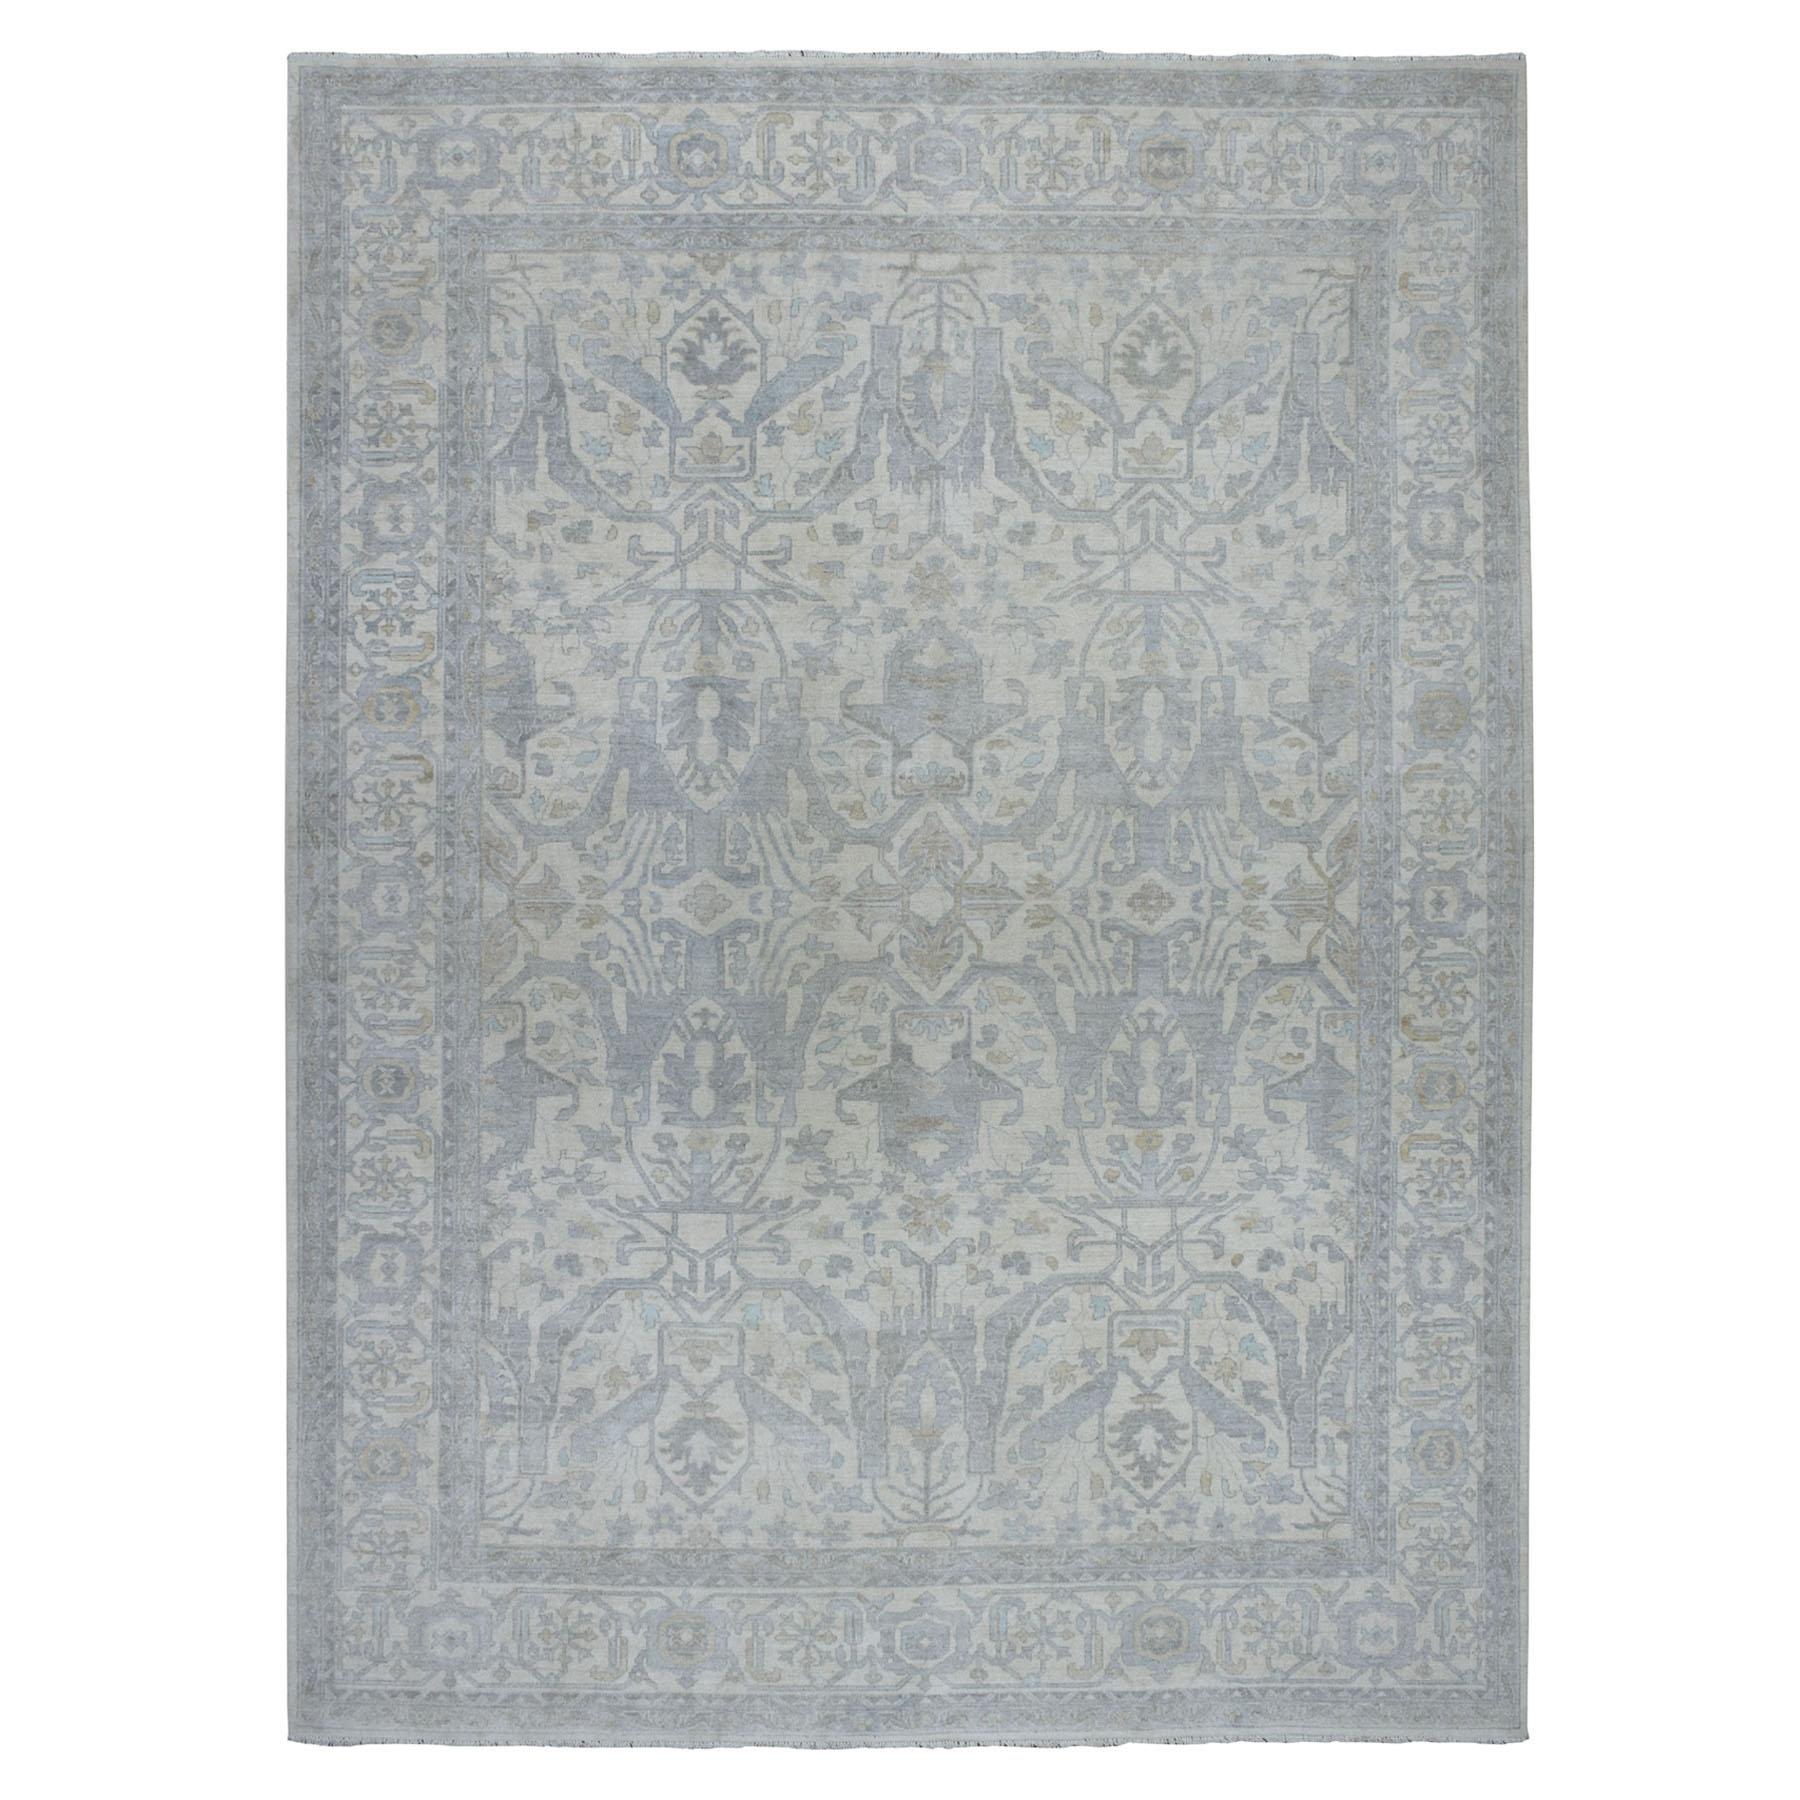 9'X12' White Wash Peshawar Pure Wool Hand-Knotted Oriental Rug moaeada9